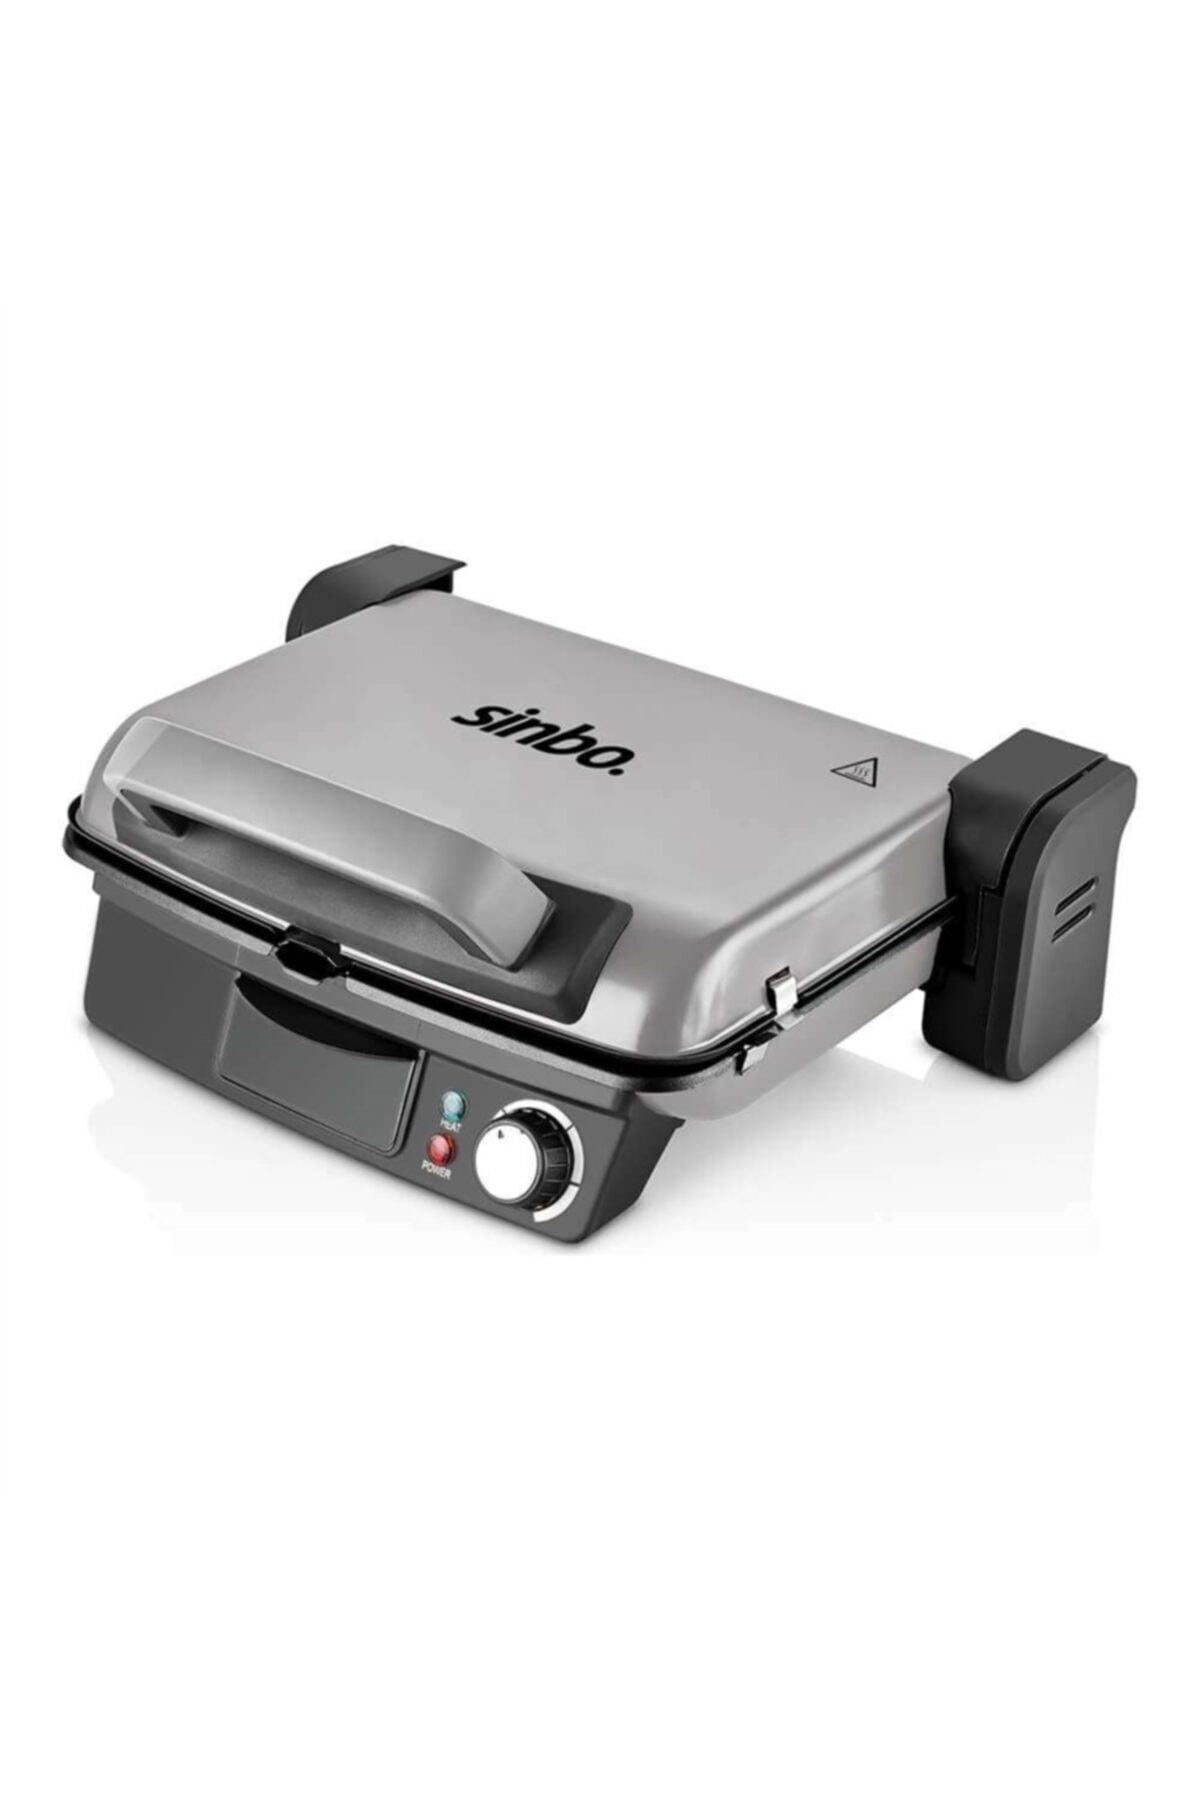 Toast machine ssm-2552